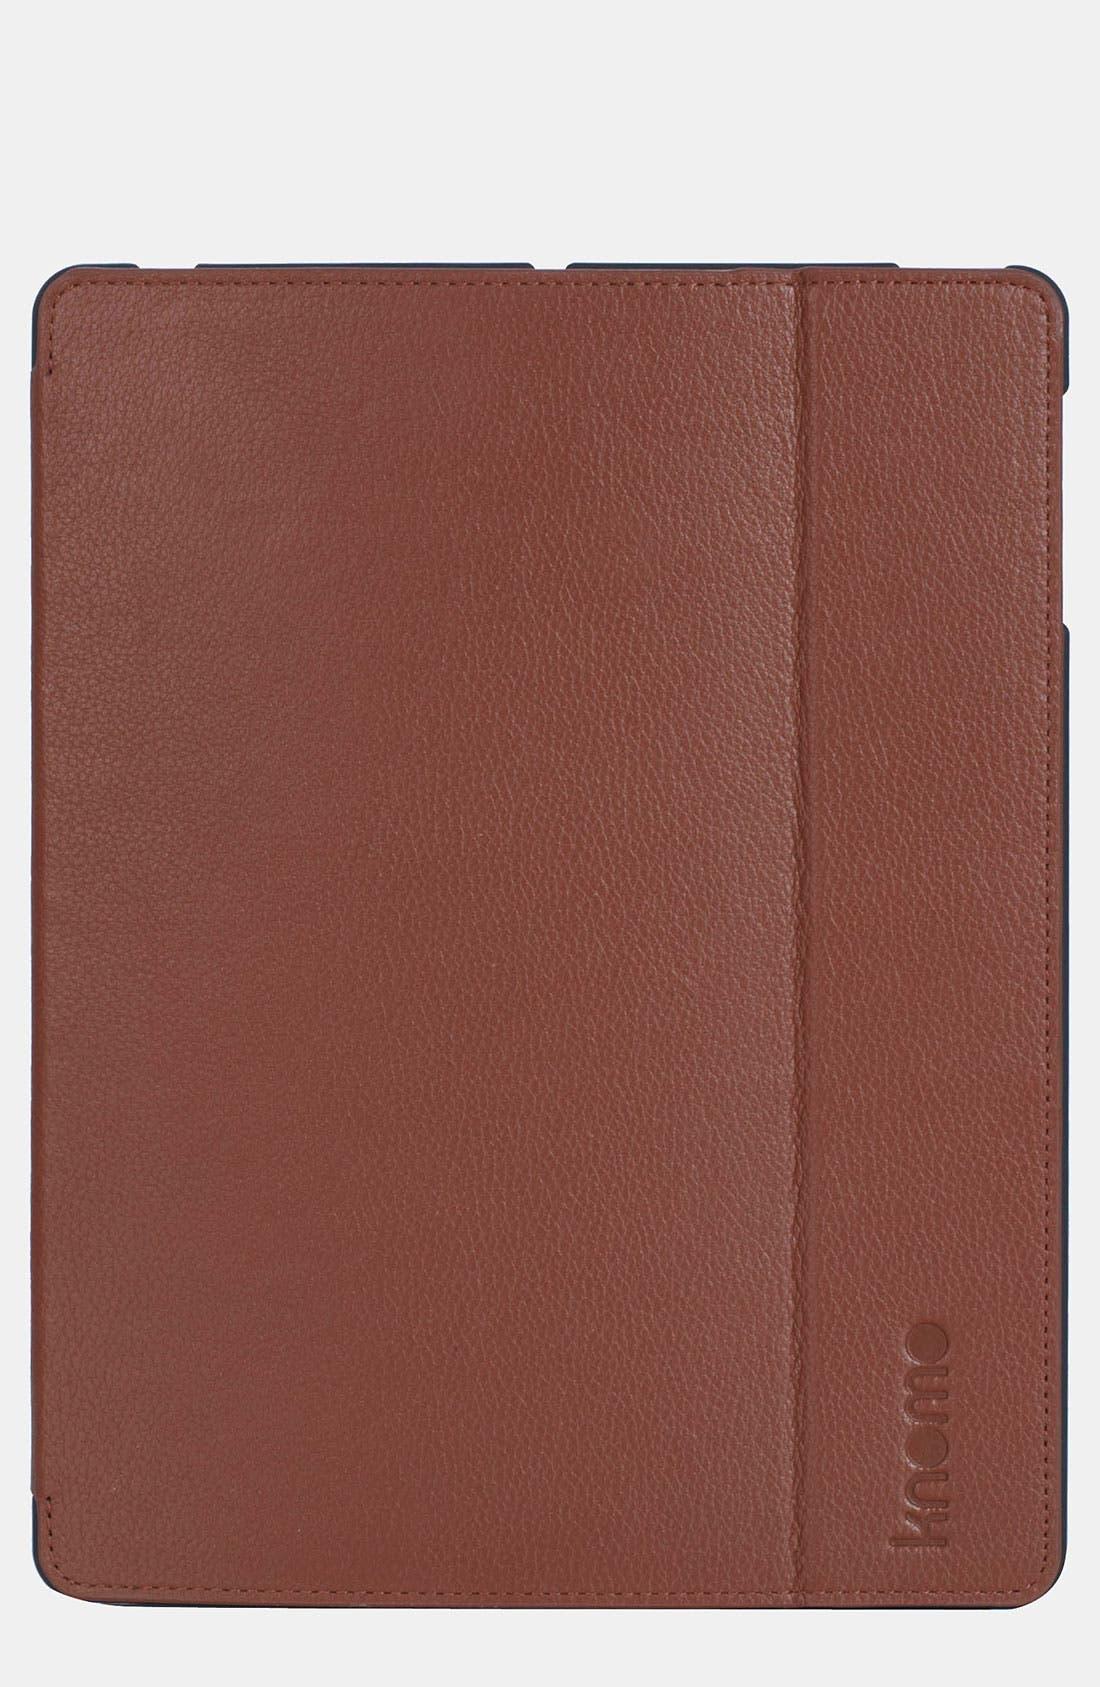 Alternate Image 1 Selected - KNOMO London iPad 3 Portfolio Case